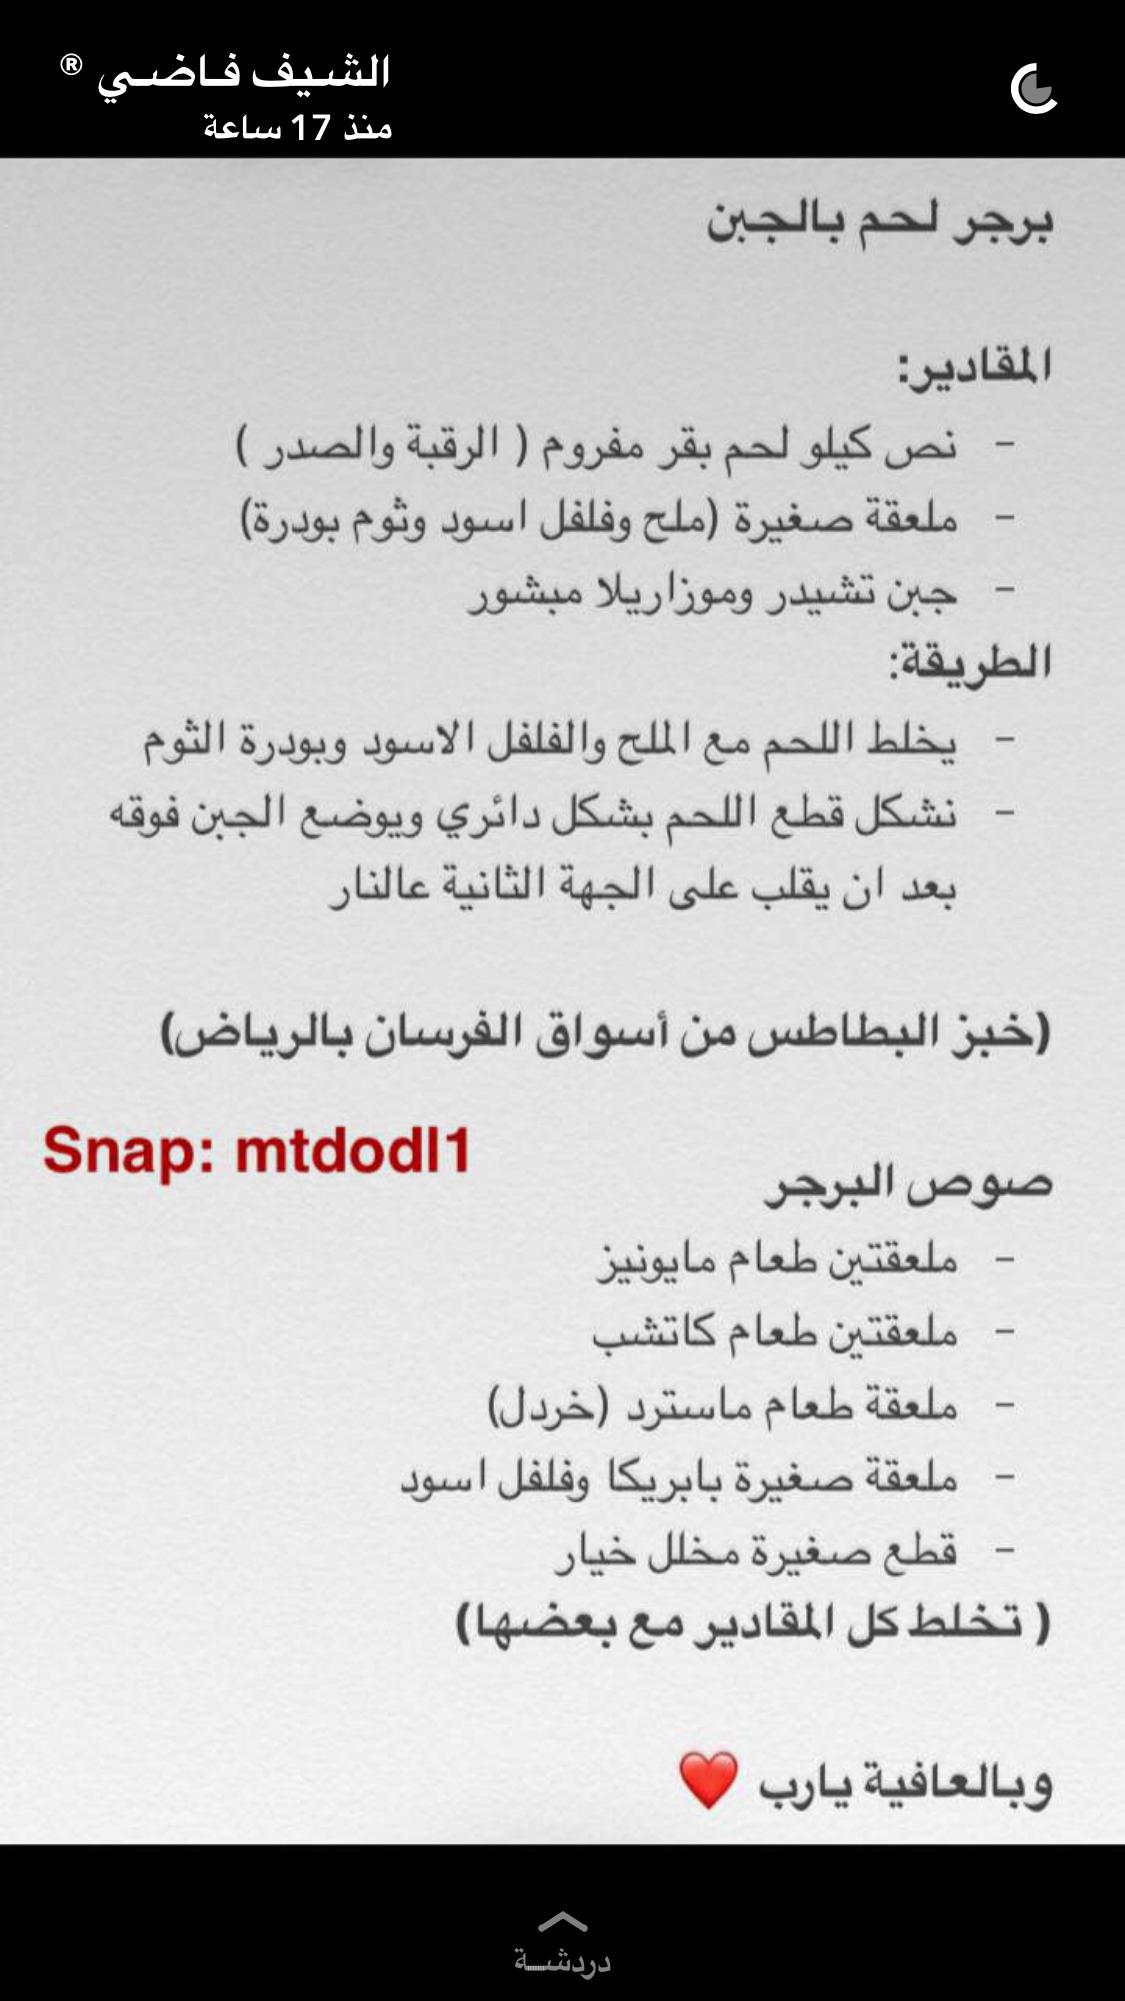 Pin By Amjaade Al Halwan On وصفات بالعربي Design Fashion Design Bullet Journal